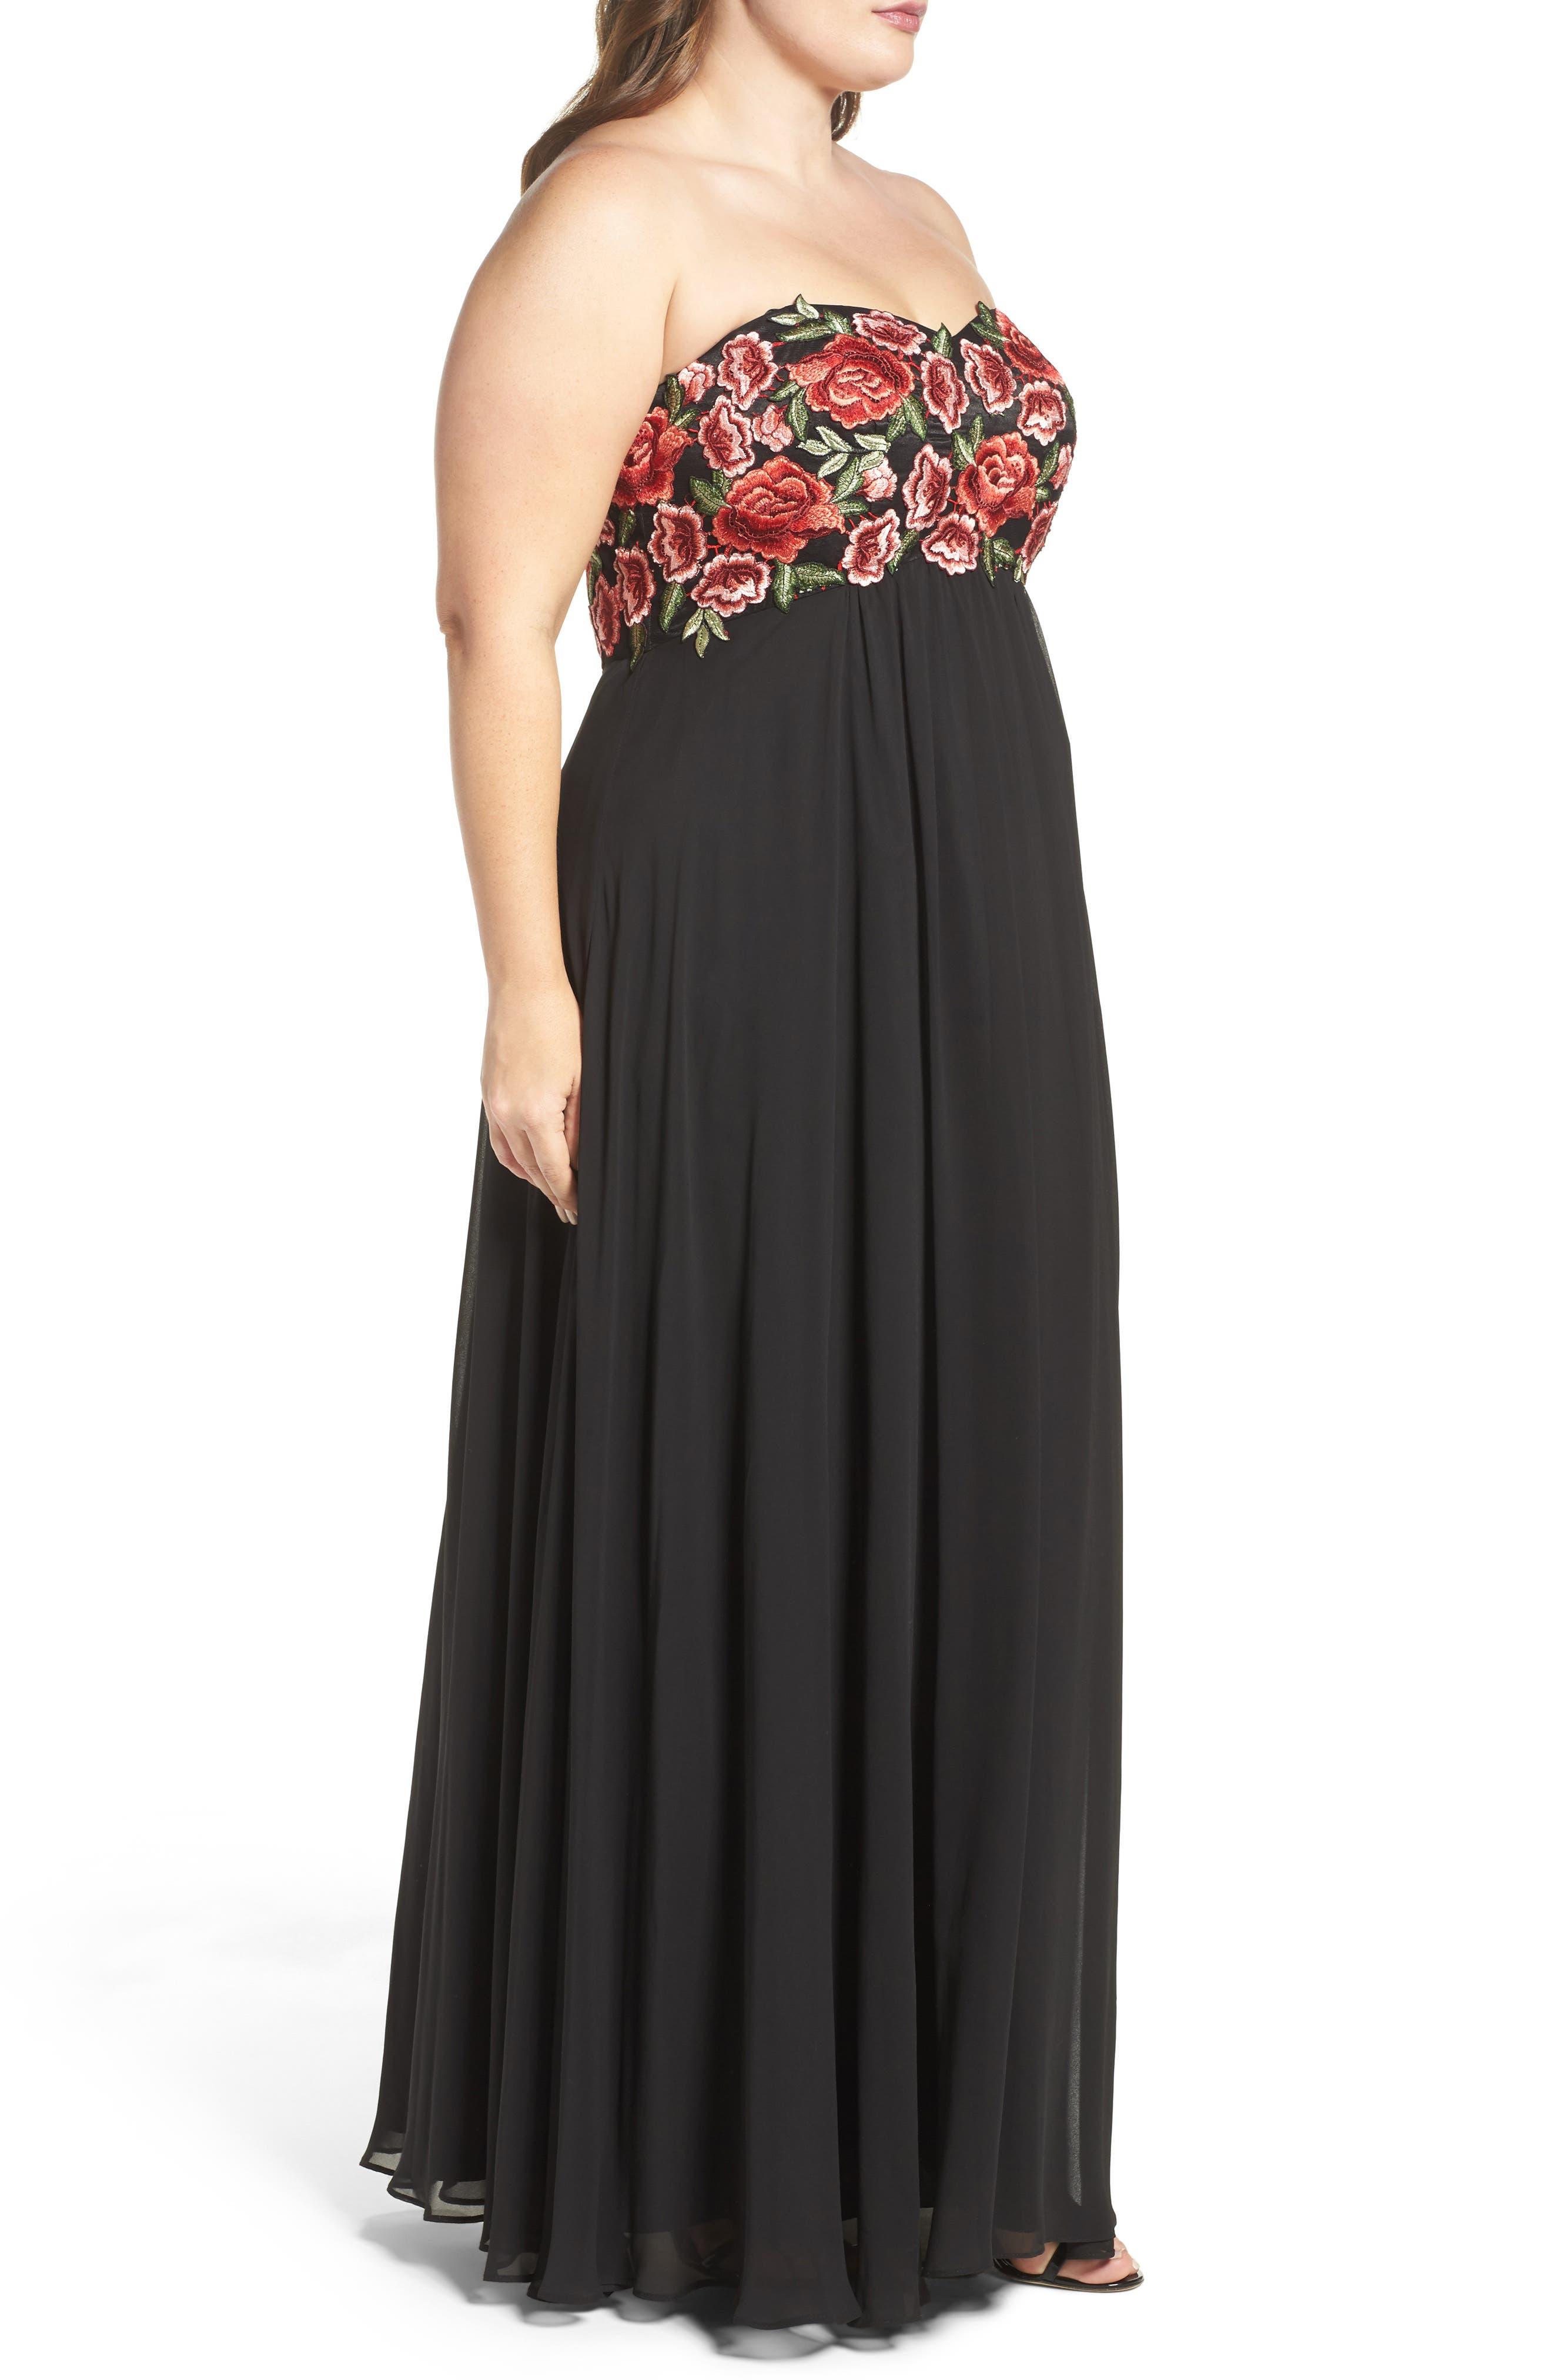 Floral Appliqué Strapless Gown,                             Alternate thumbnail 3, color,                             Black/ Red